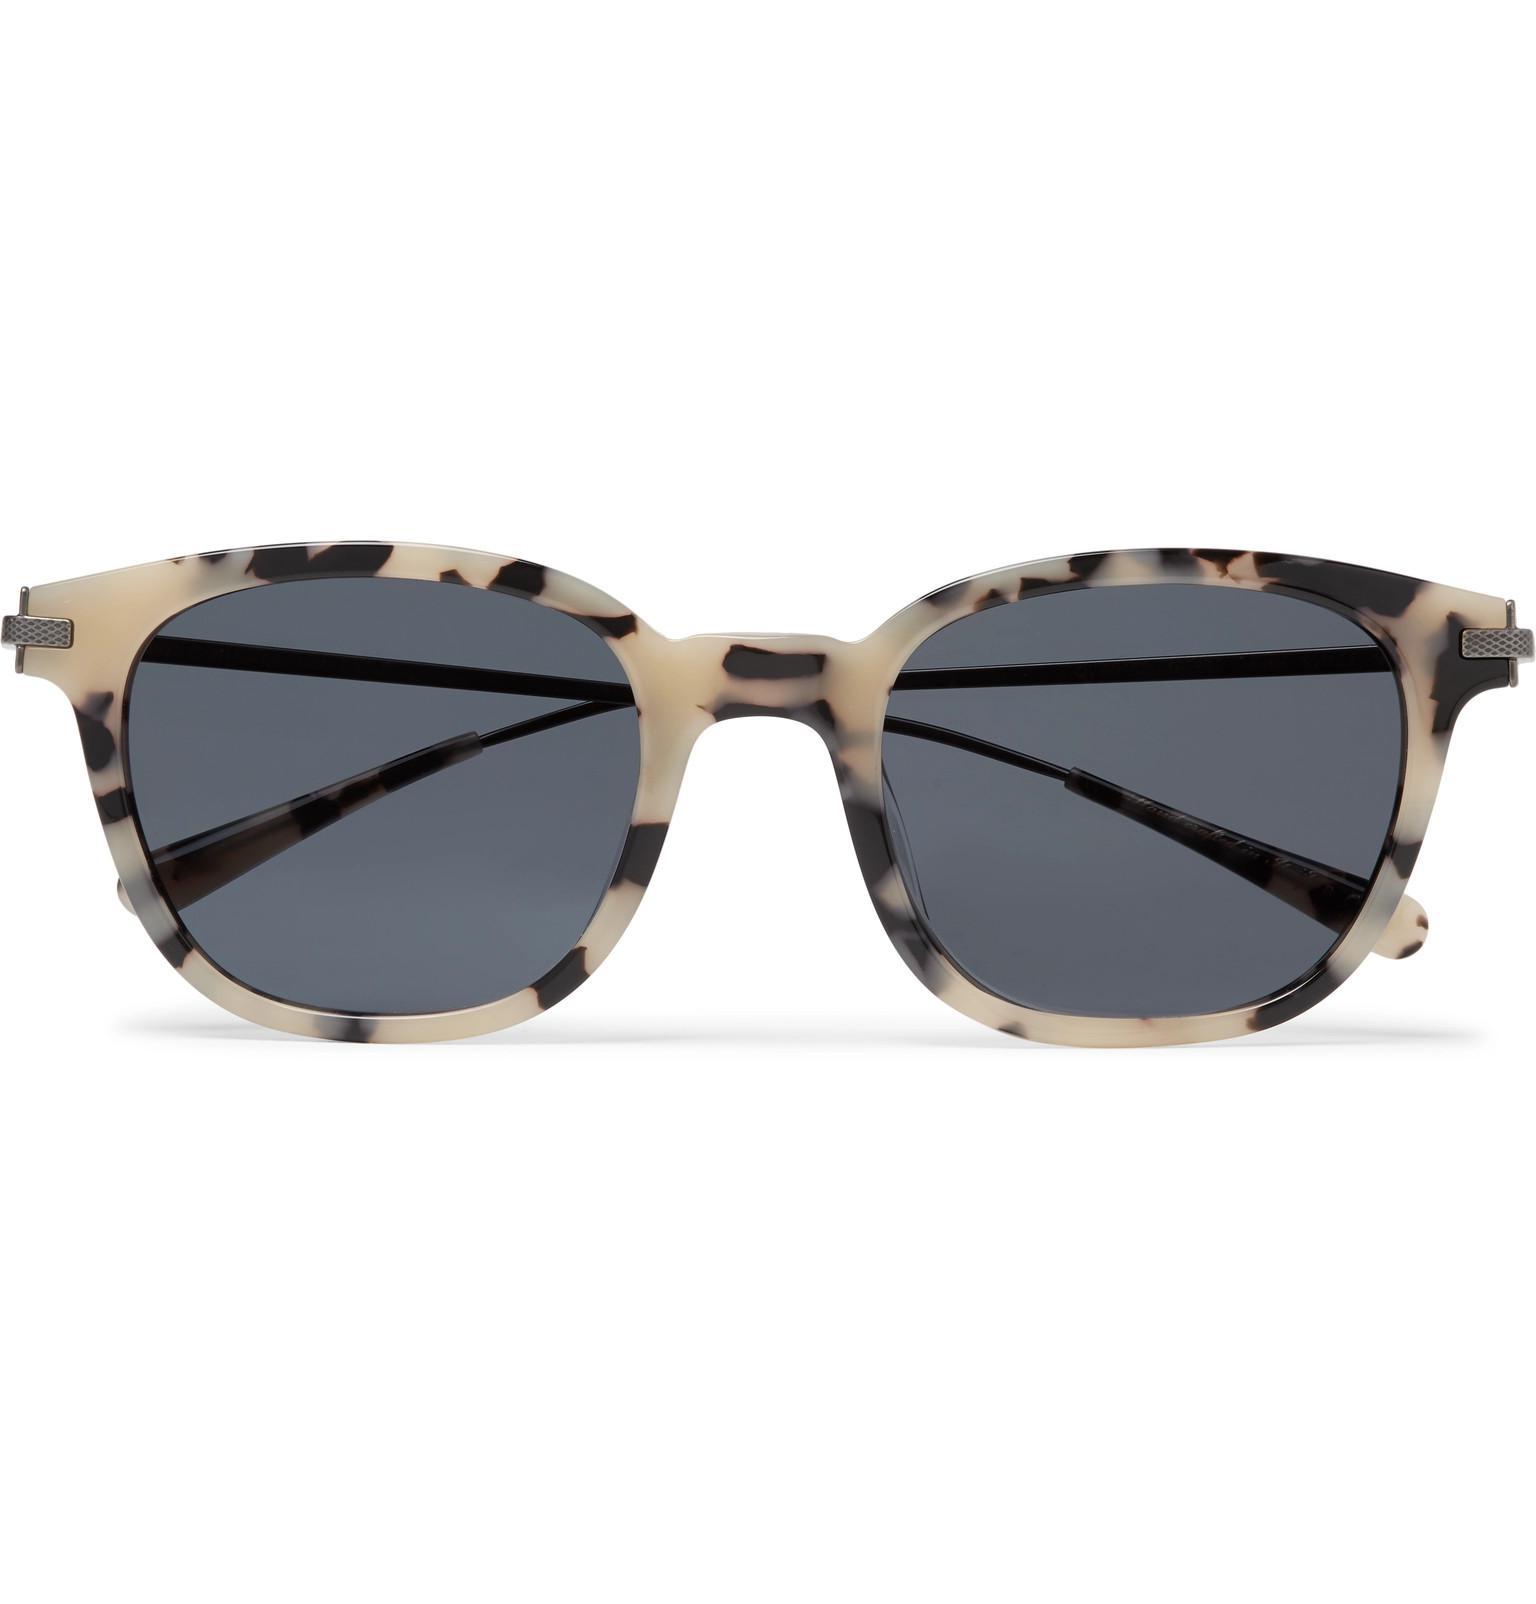 e72e0f143865 Berluti. Men s + Oliver Peoples Miami Square-frame Tortoiseshell Acetate  And Gunmetal-tone Sunglasses